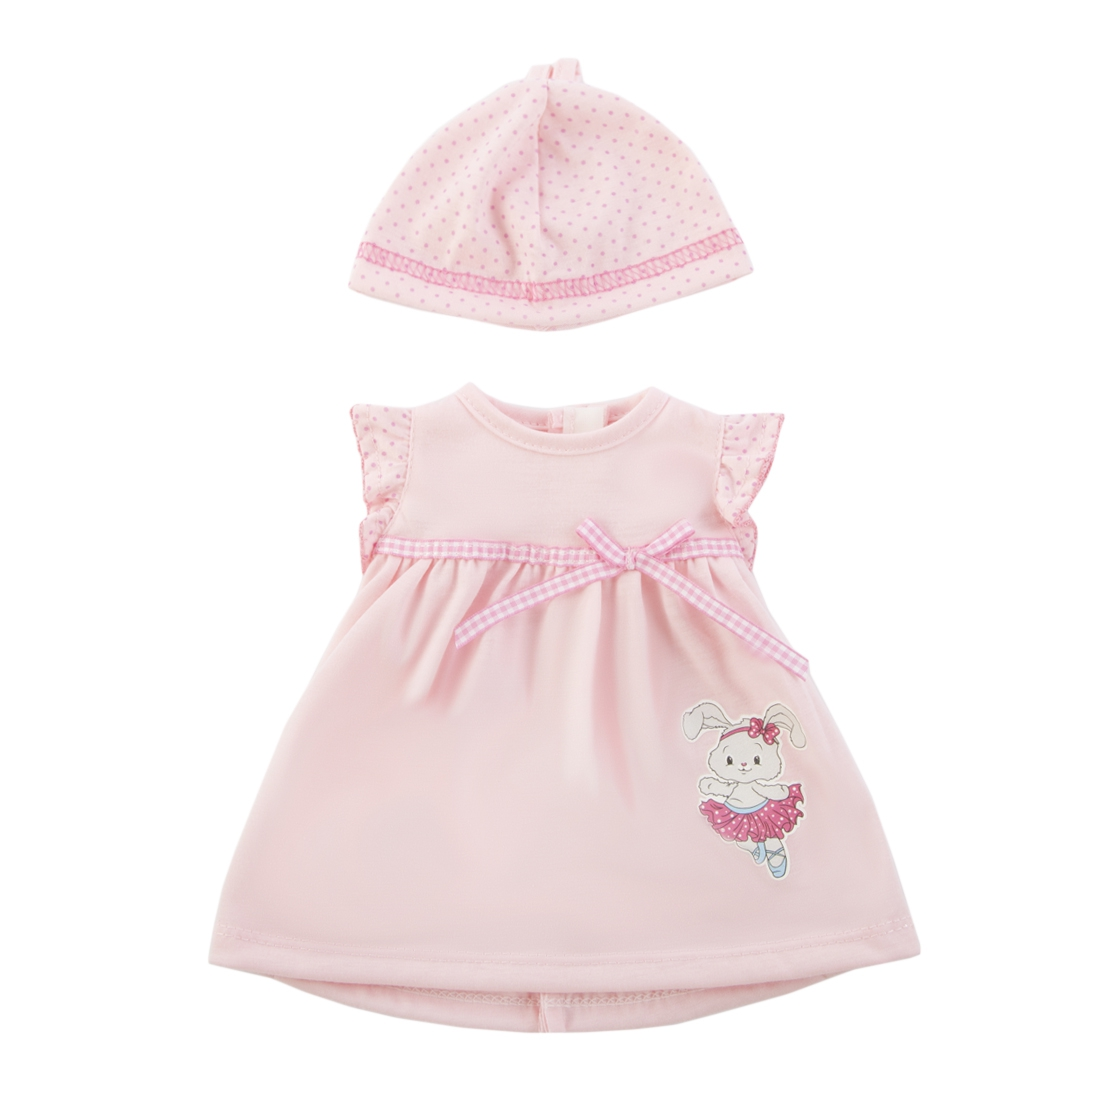 Одежда для кукол Mary Poppins Платье для куклы Mary Poppins кроватка для куклы качалка mary poppins с балдахином зайка